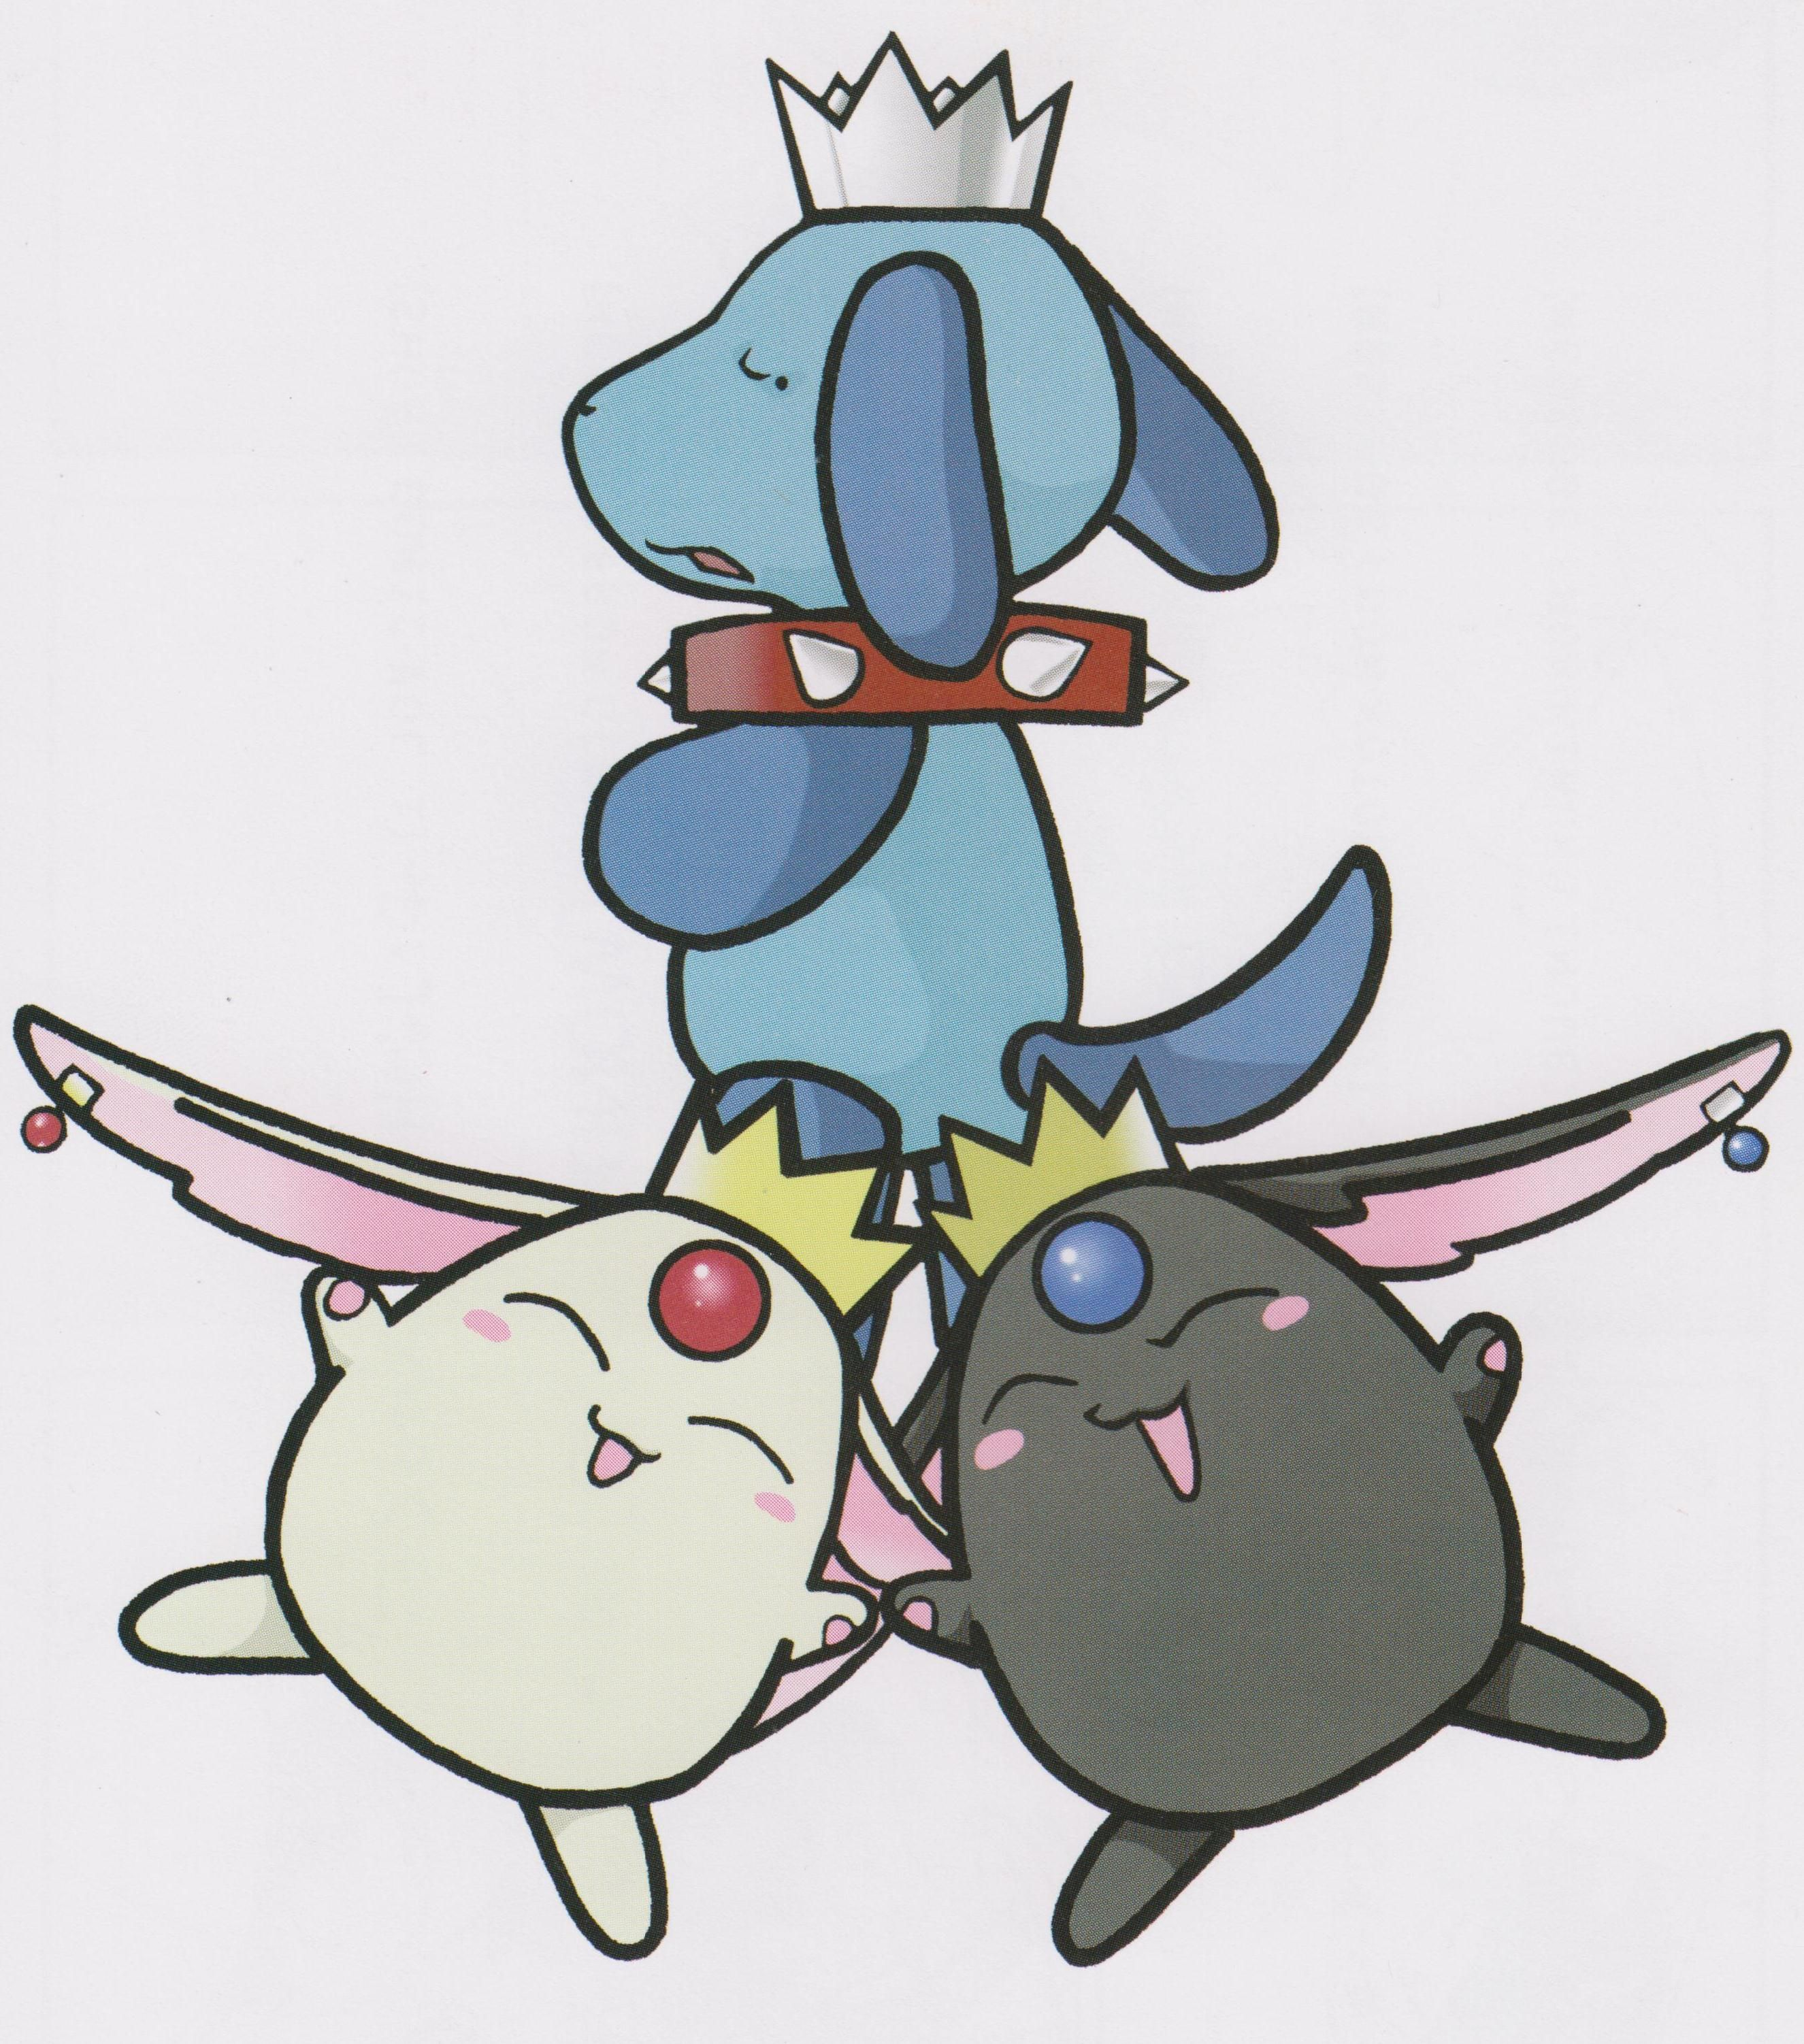 Ioryogi & Mokona Modoki Anime, Anime images, Xxxholic